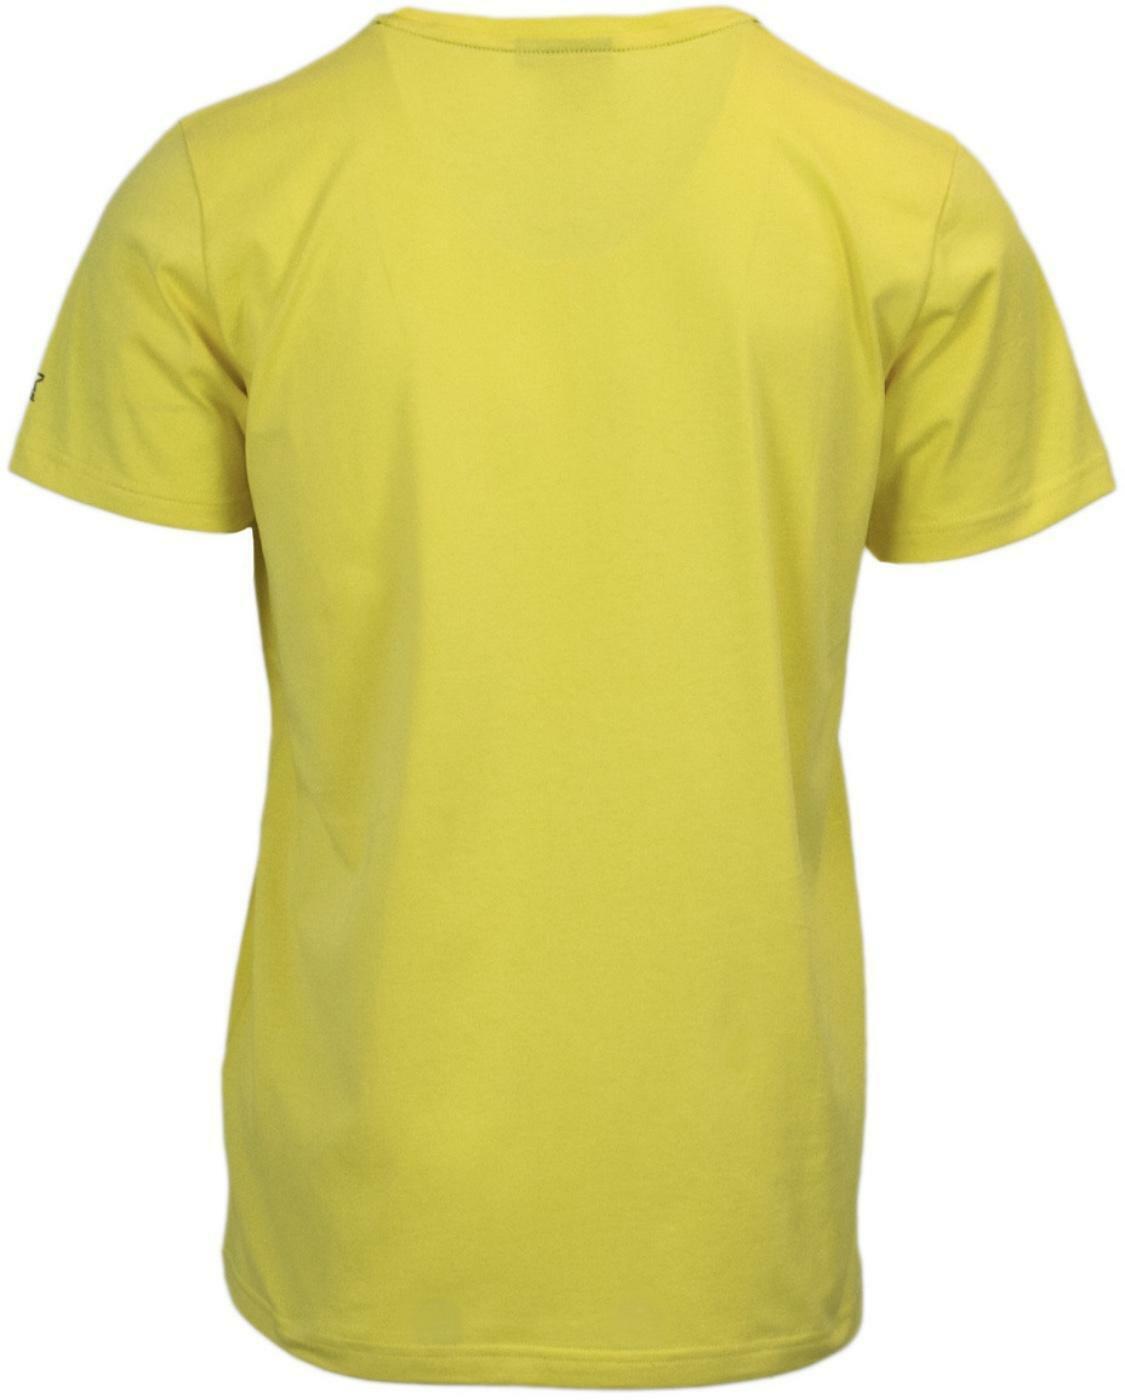 starter starter t-shirt uomo giallo nero tp9-72402